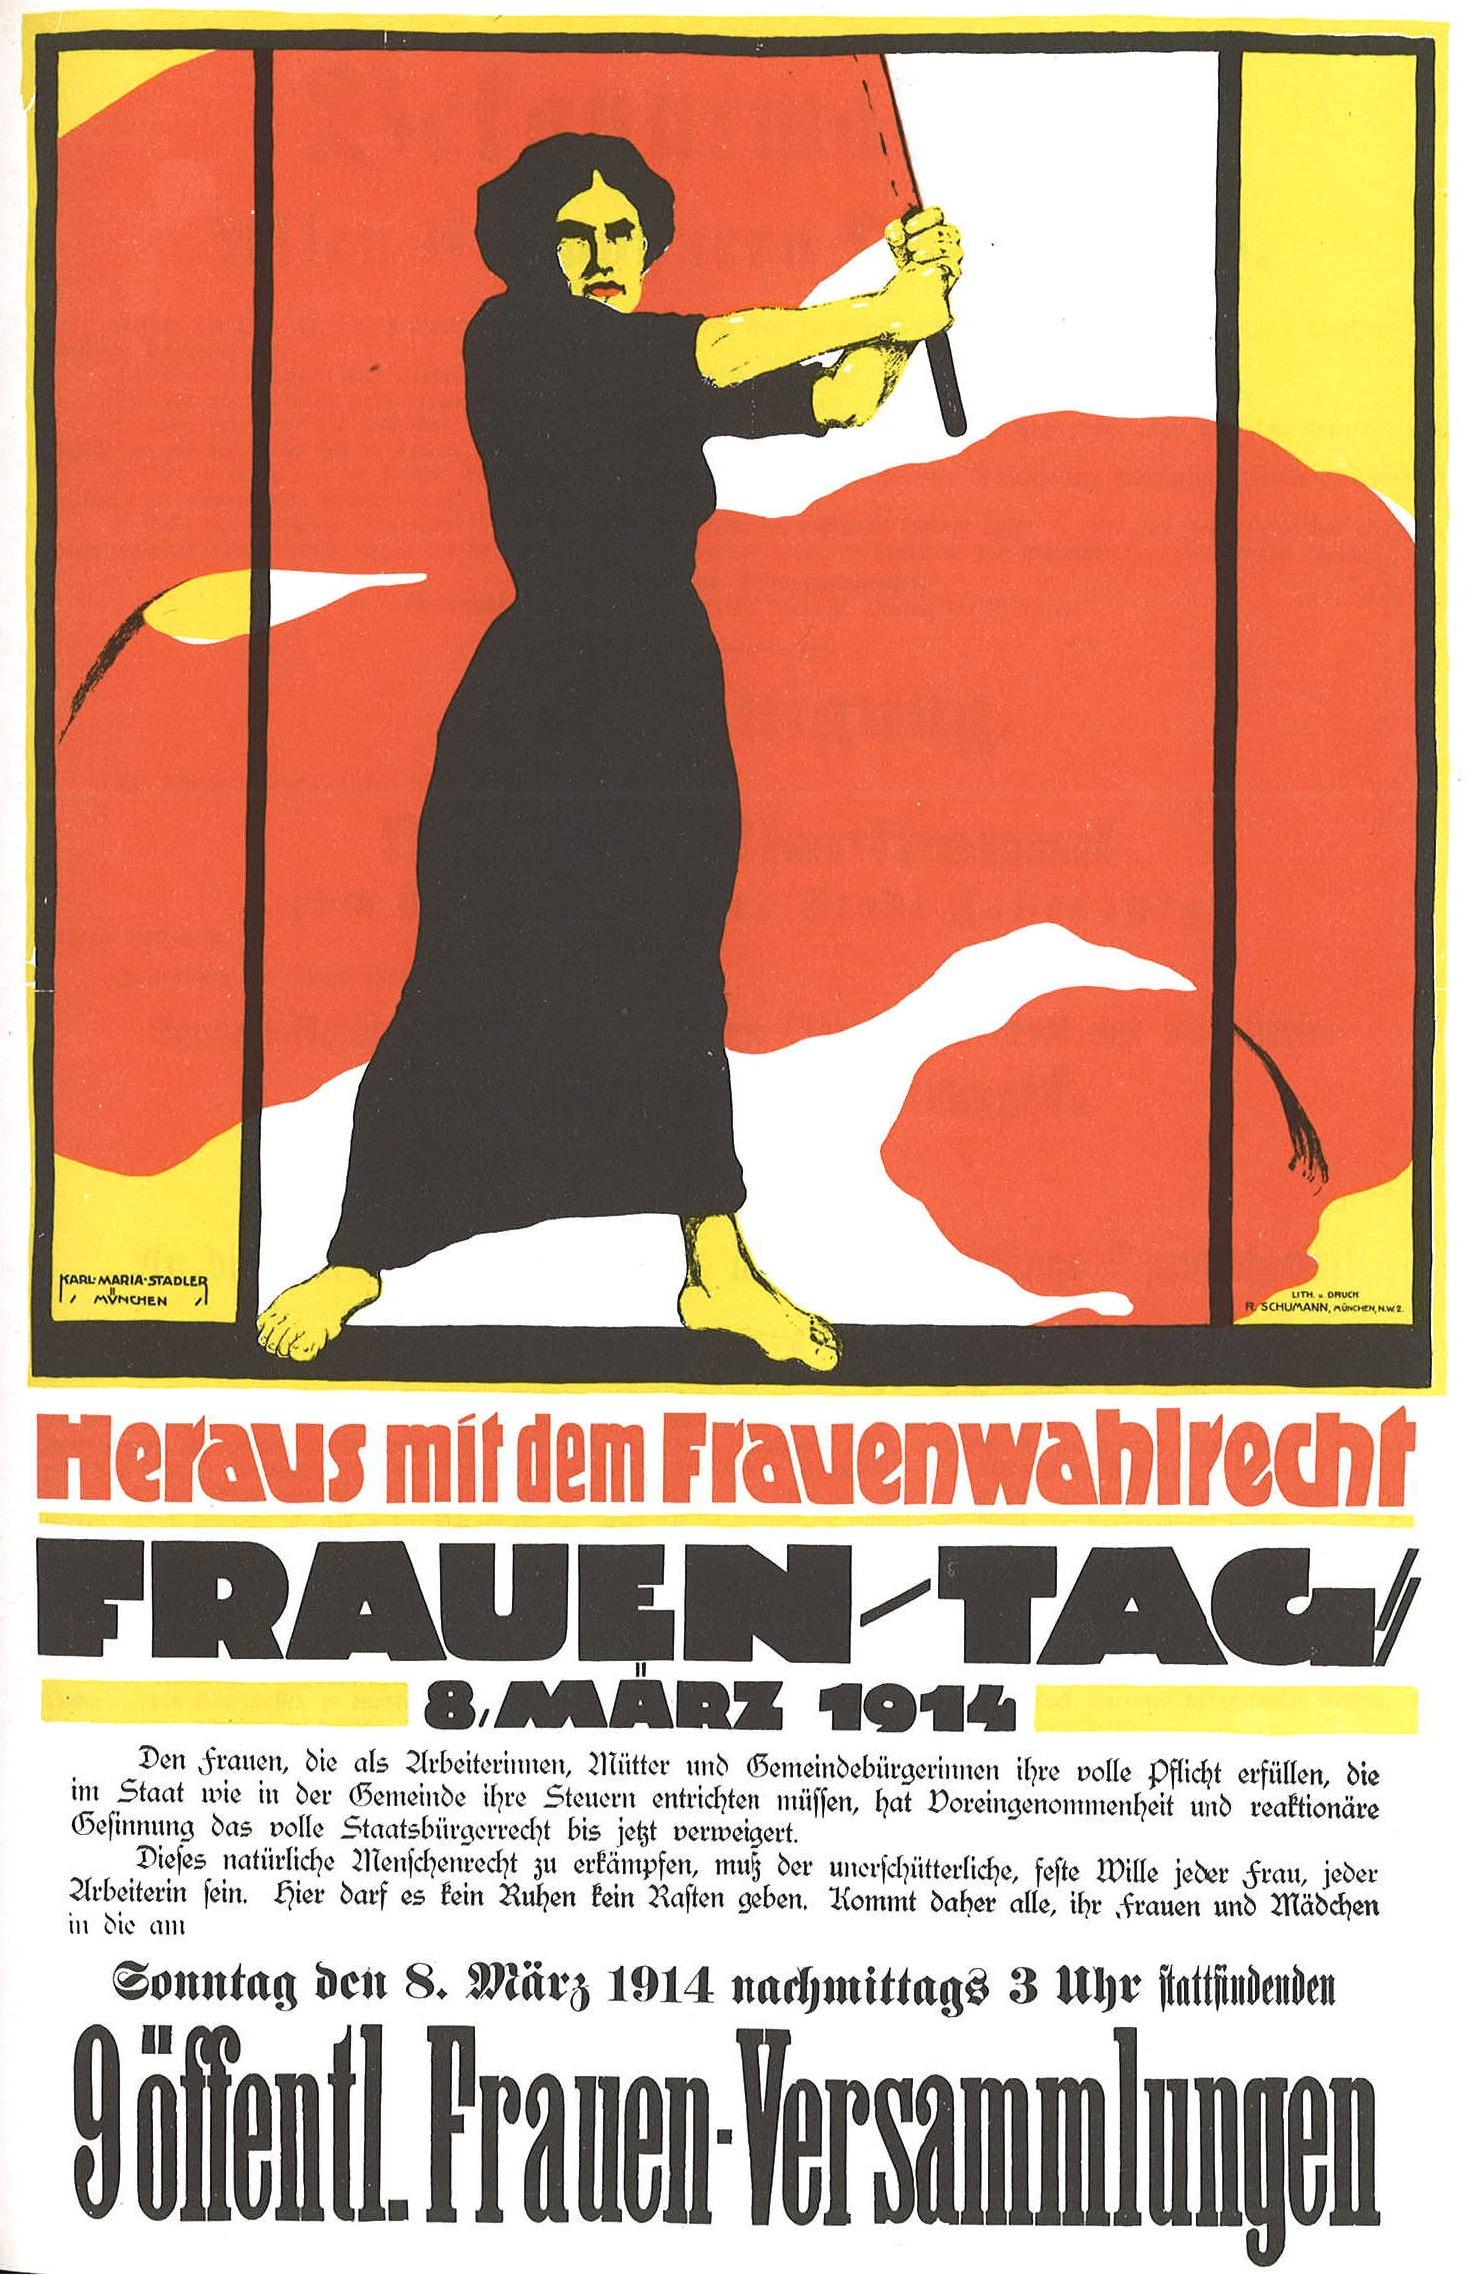 http://upload.wikimedia.org/wikipedia/commons/0/0a/Frauentag_1914_Heraus_mit_dem_Frauenwahlrecht.jpg